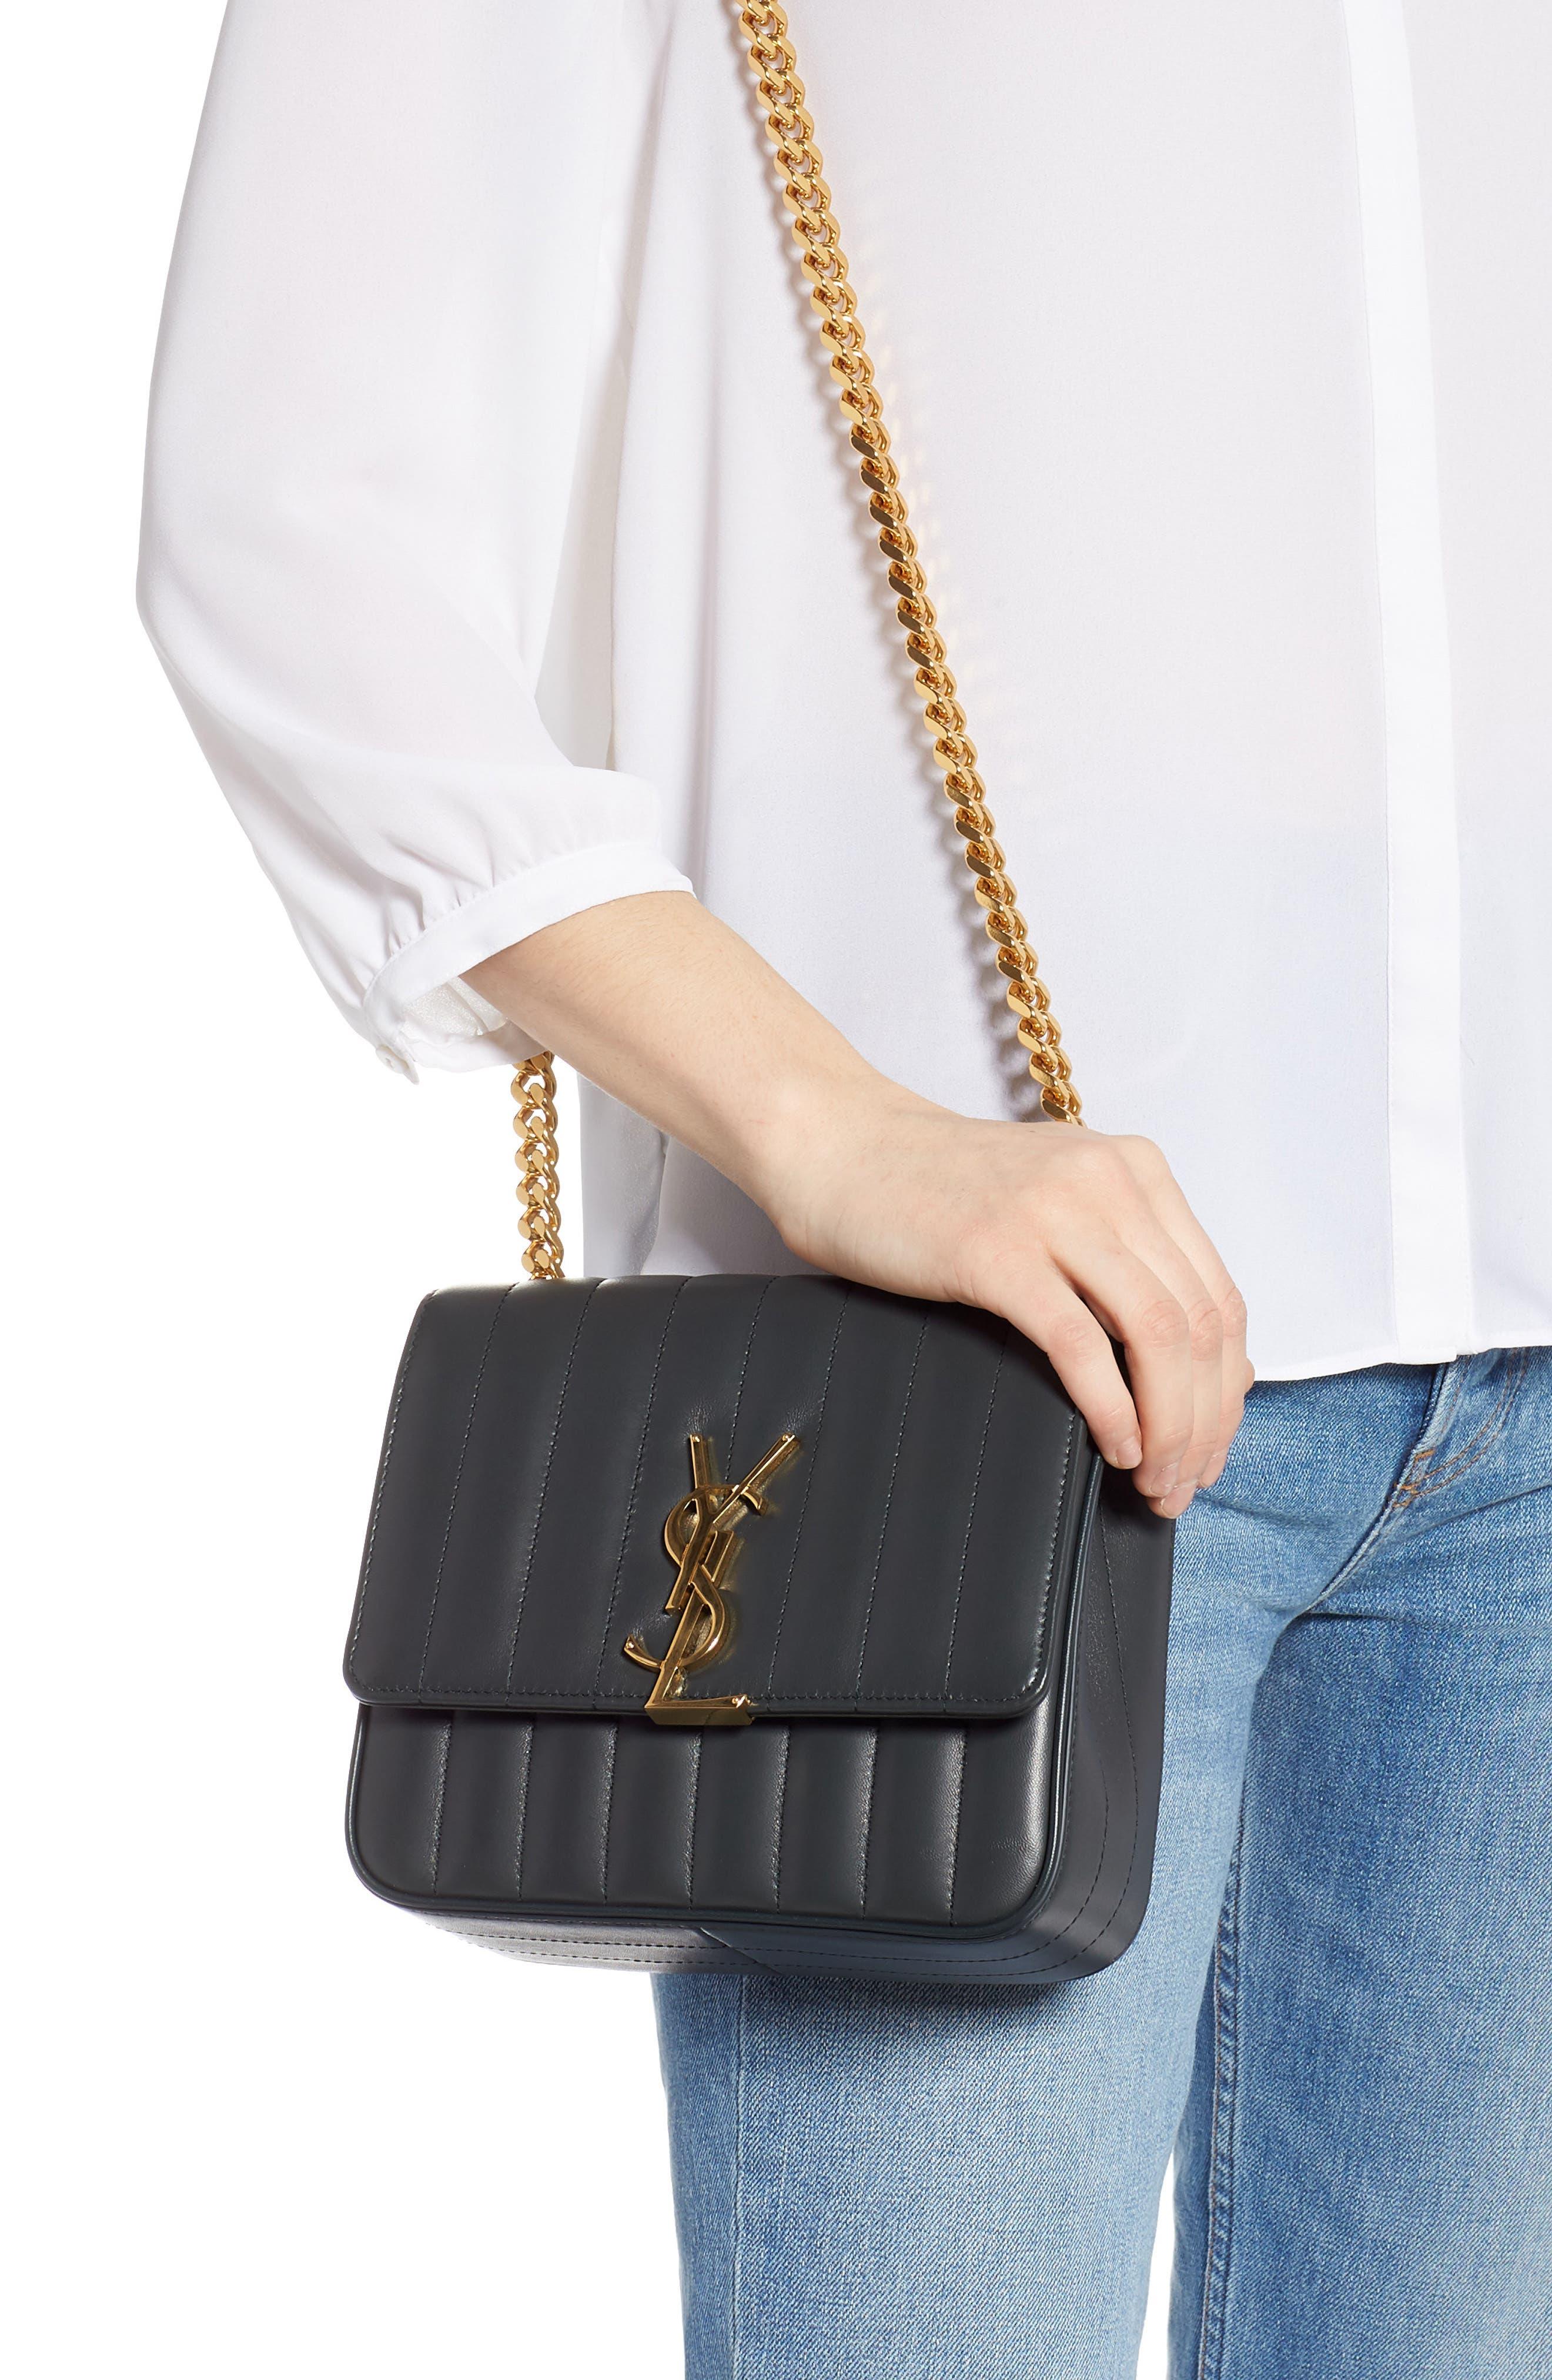 Medium Vicky Leather Crossbody Bag,                             Alternate thumbnail 2, color,                             ALGAE